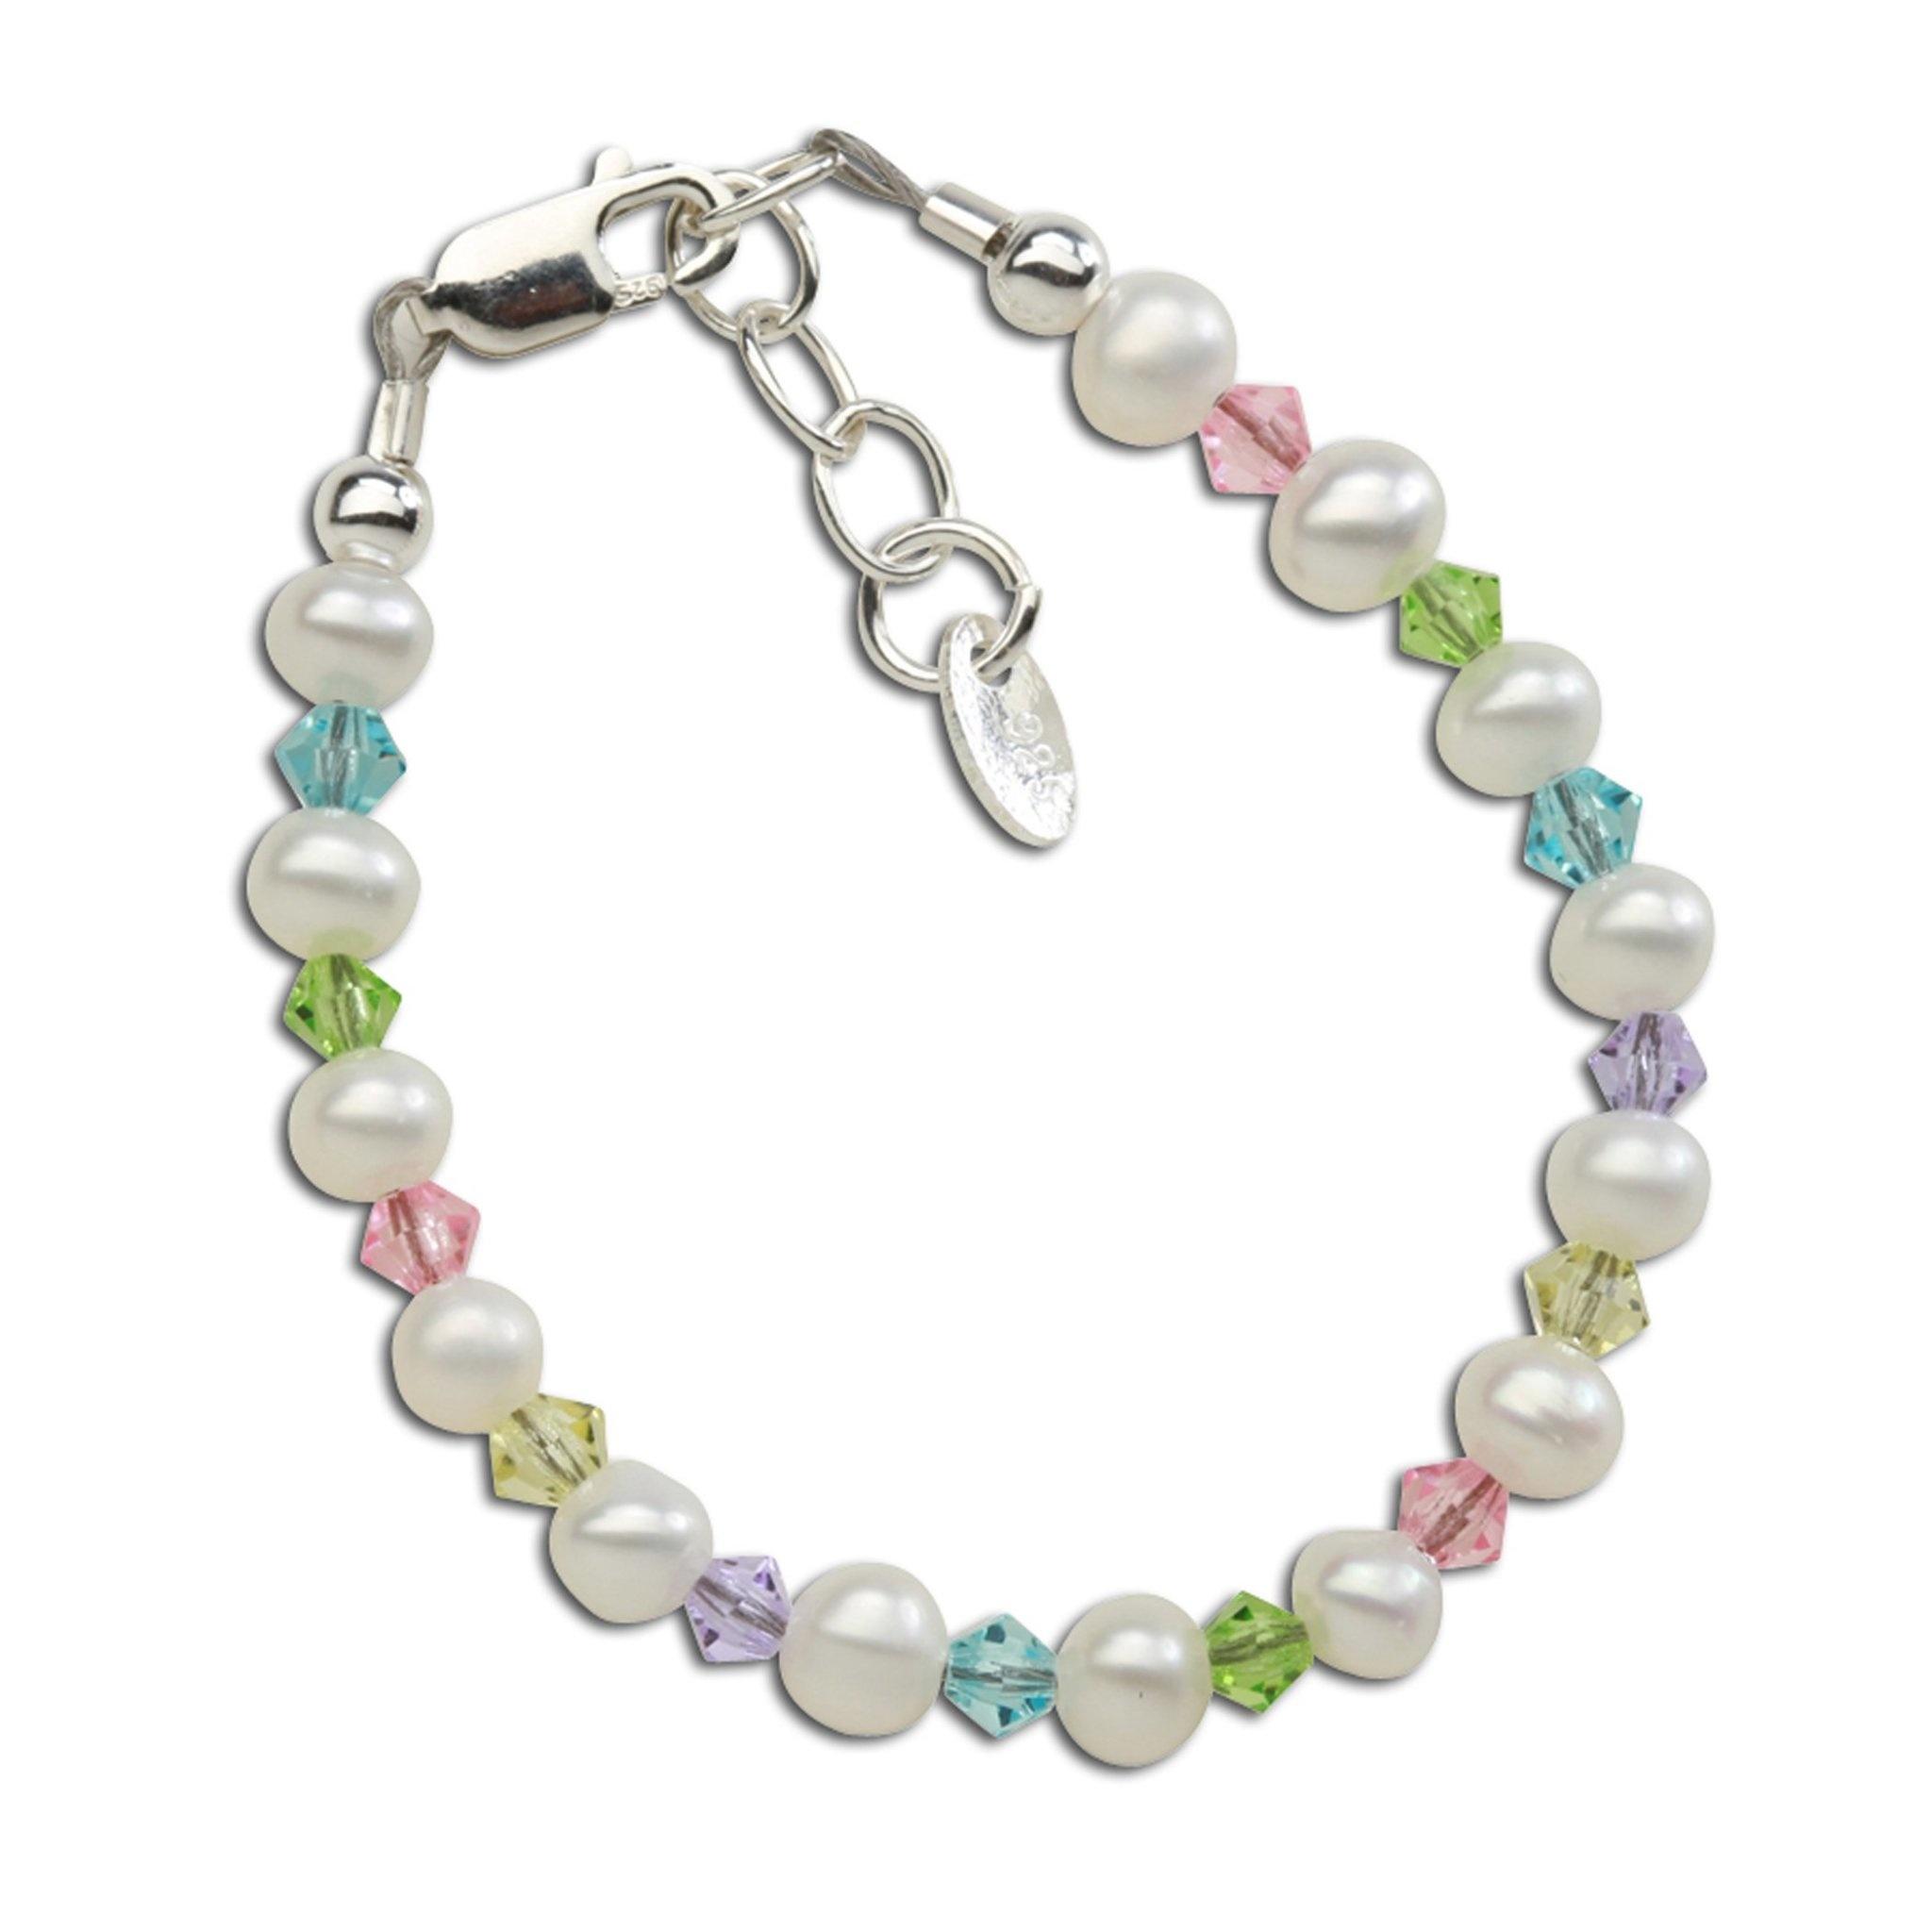 Daniela Bracelet - Silver Pearl Bracelet with Multi Crystals